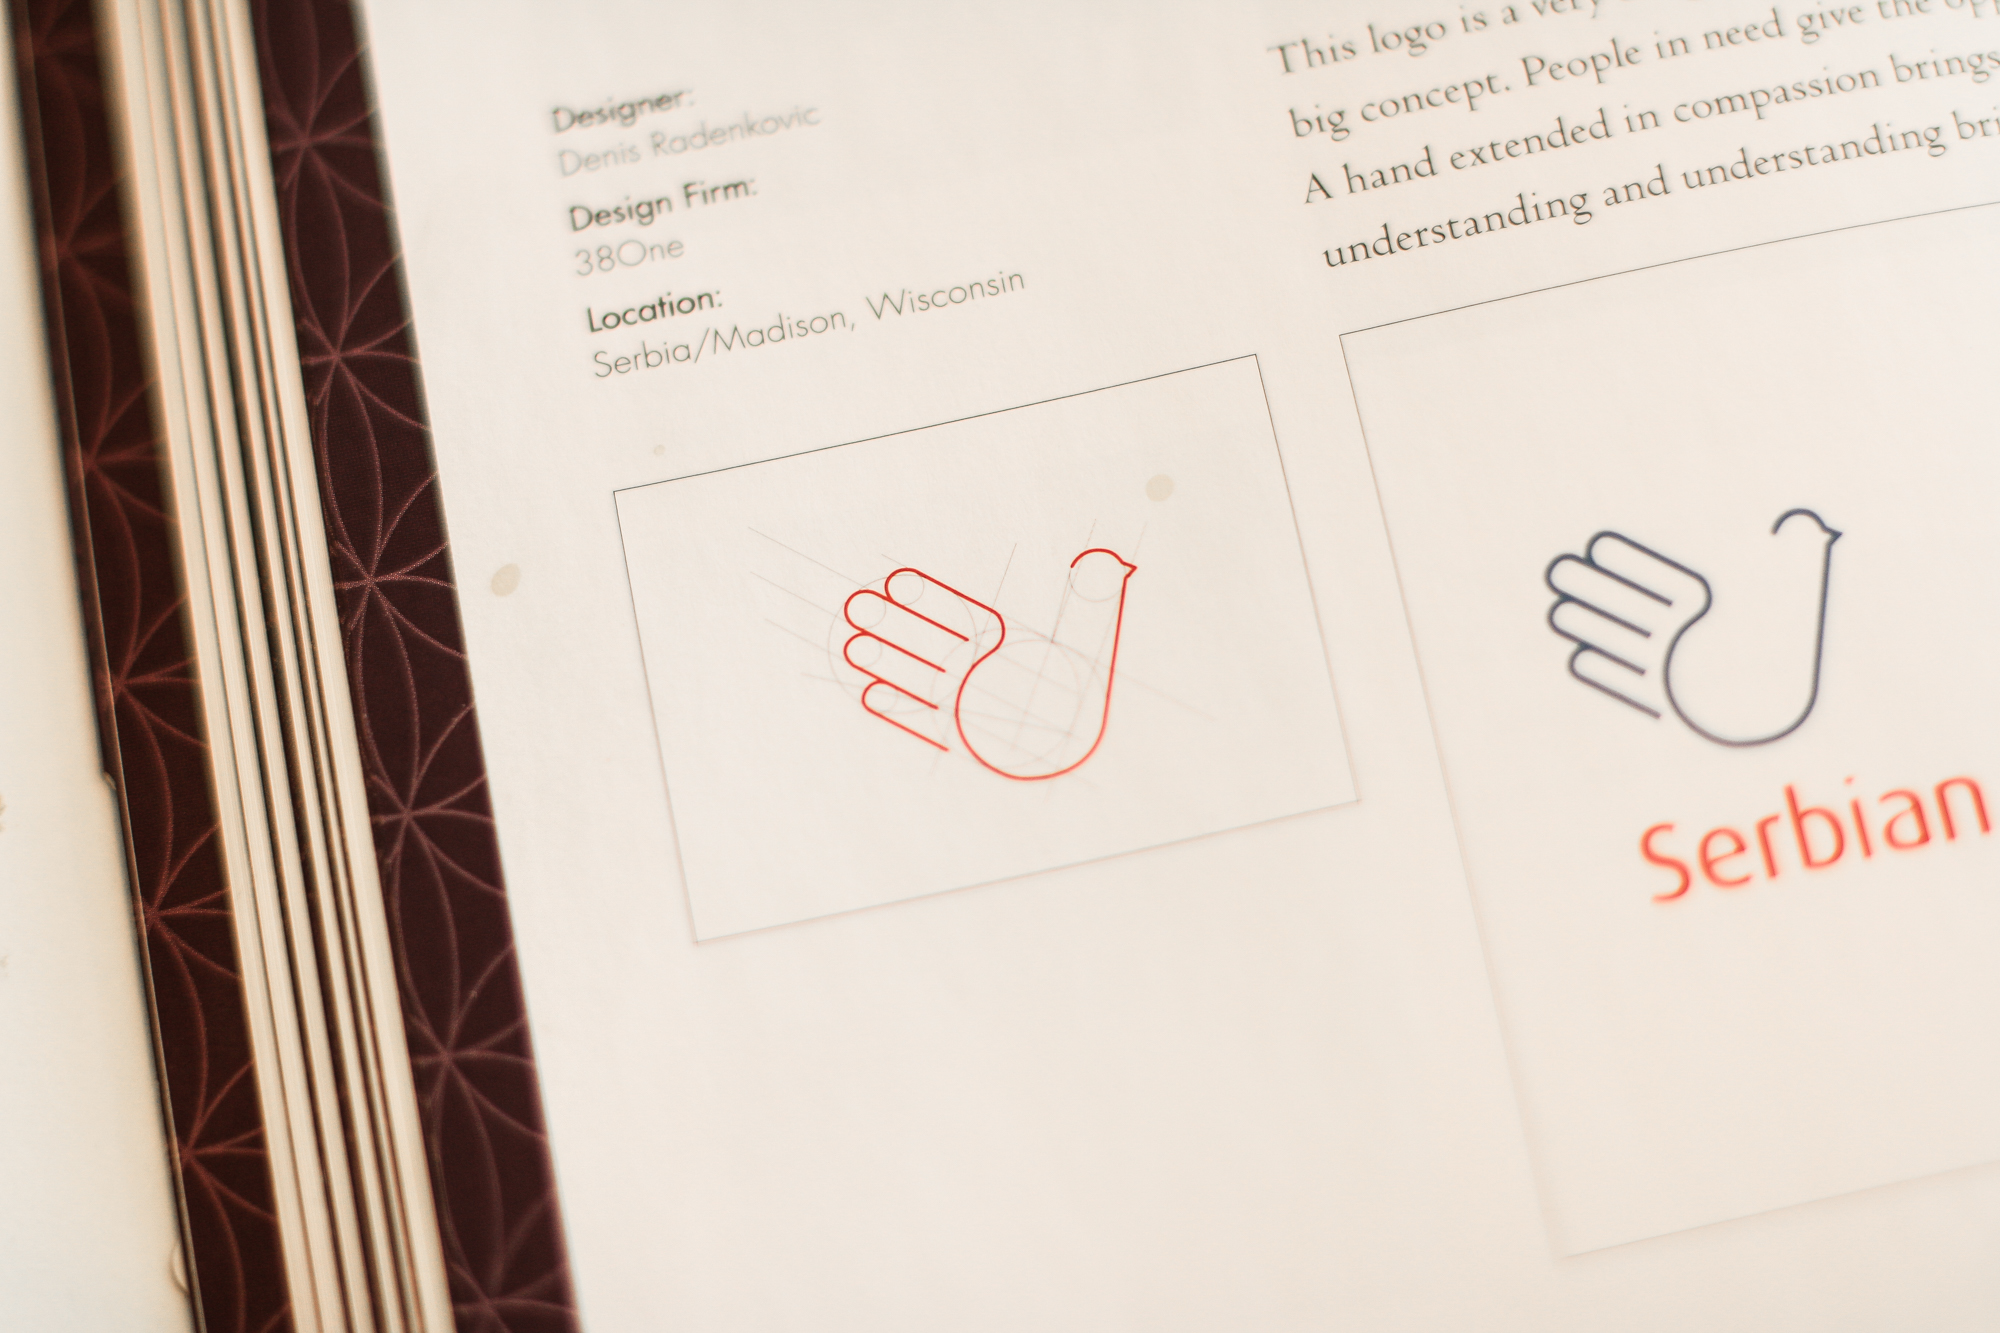 Decoding Design, by Maggie Macnab